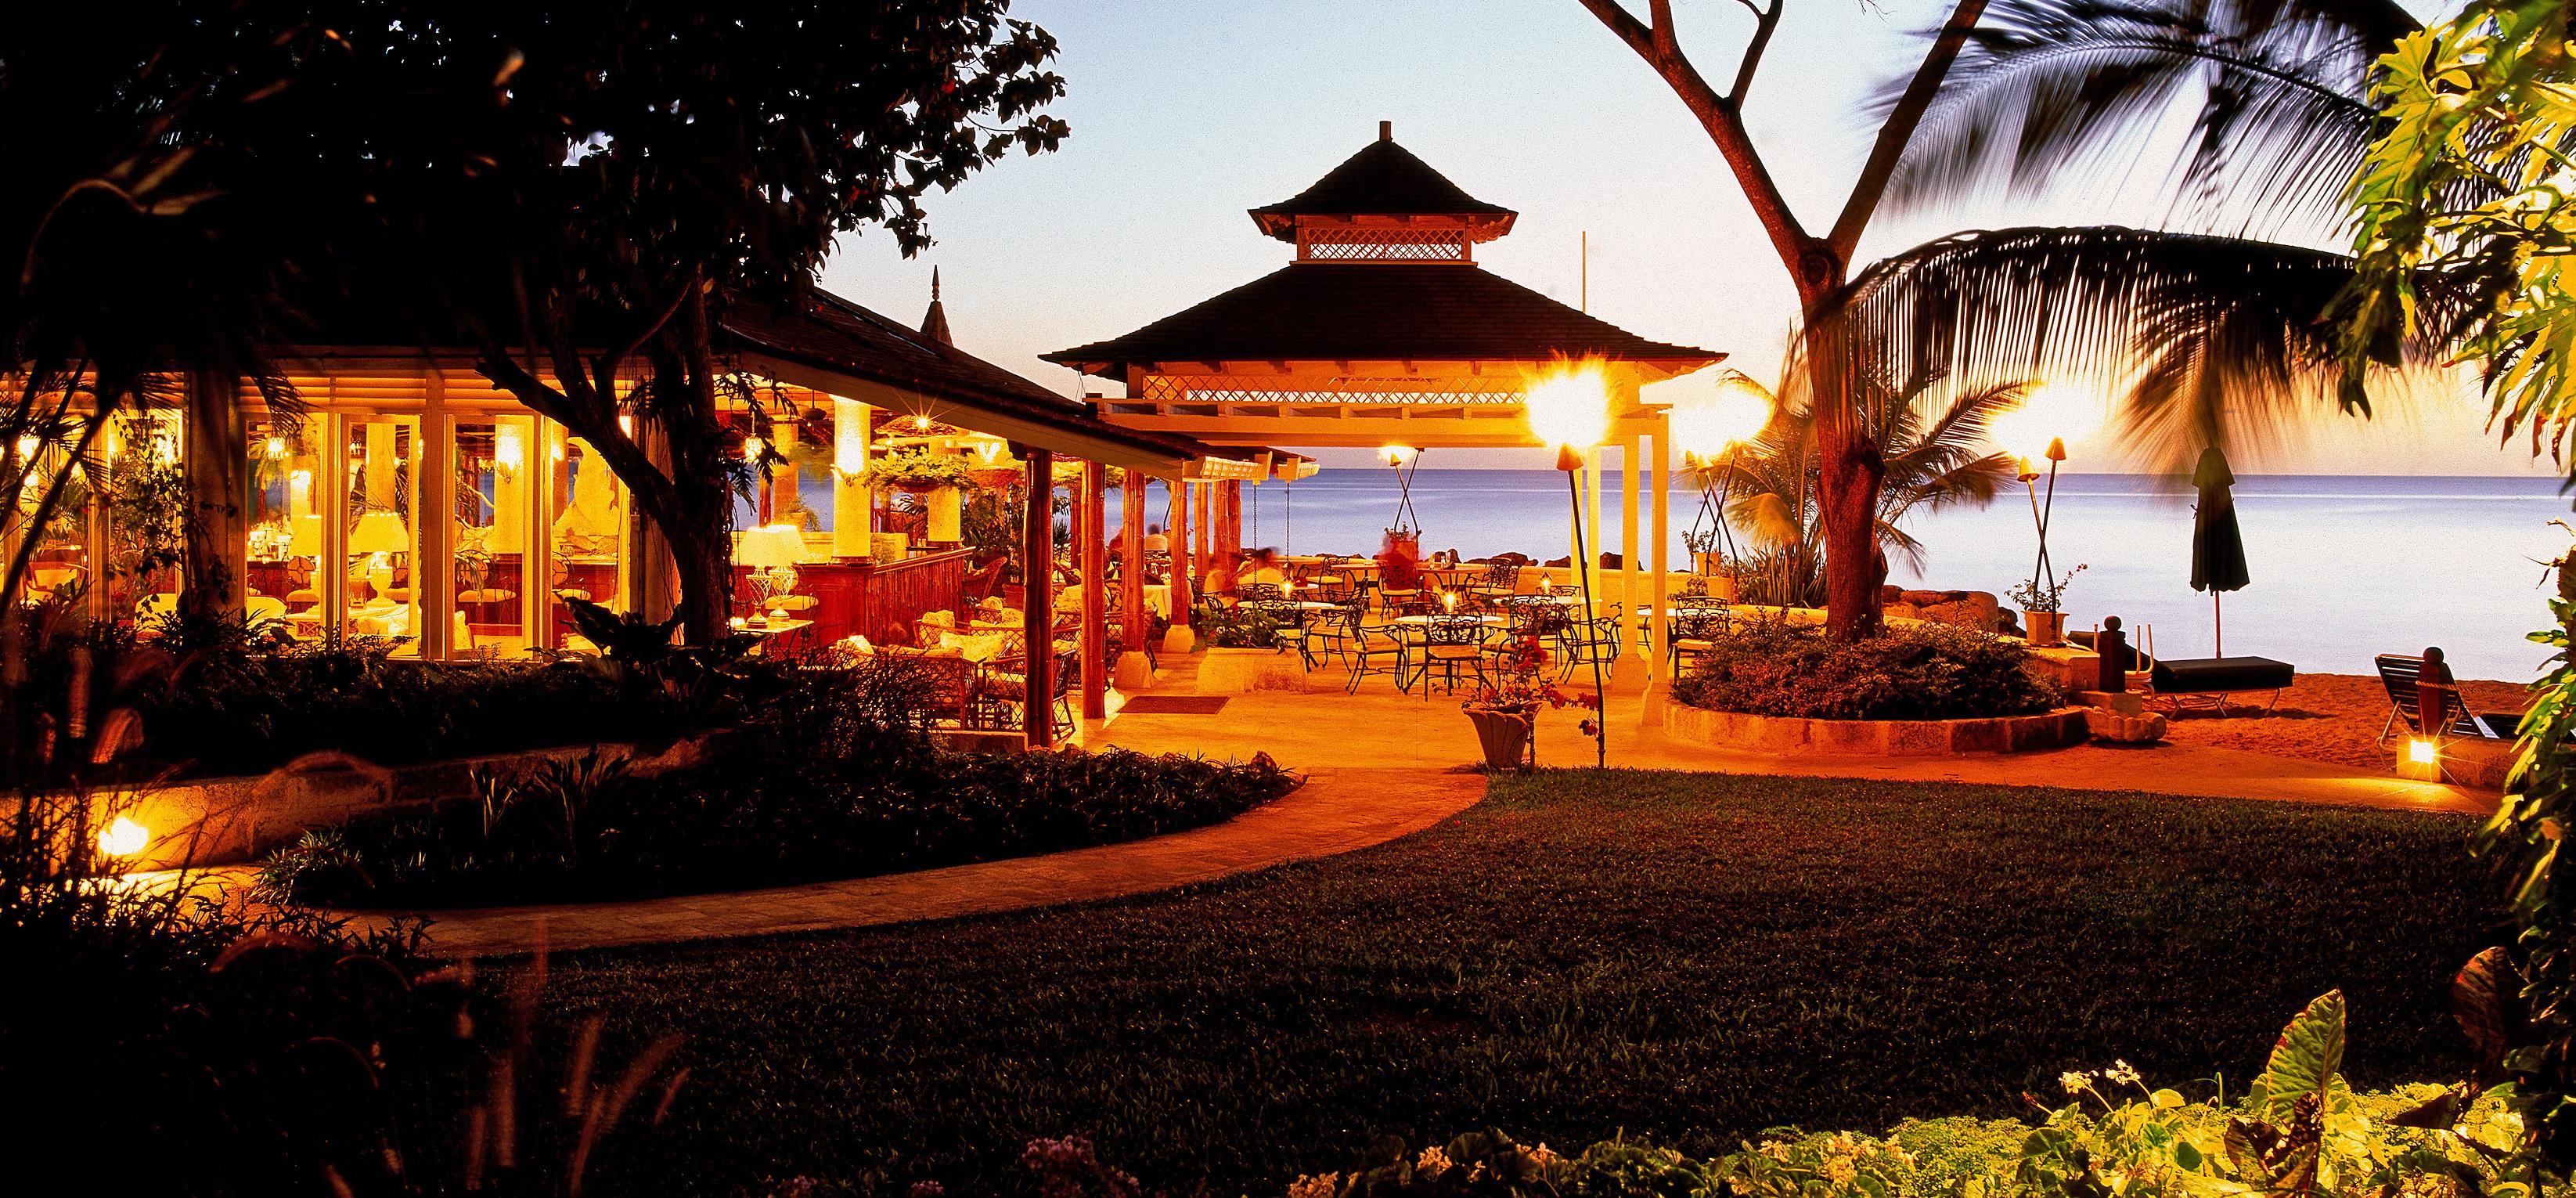 coral-reef-club-restaurant-exterior